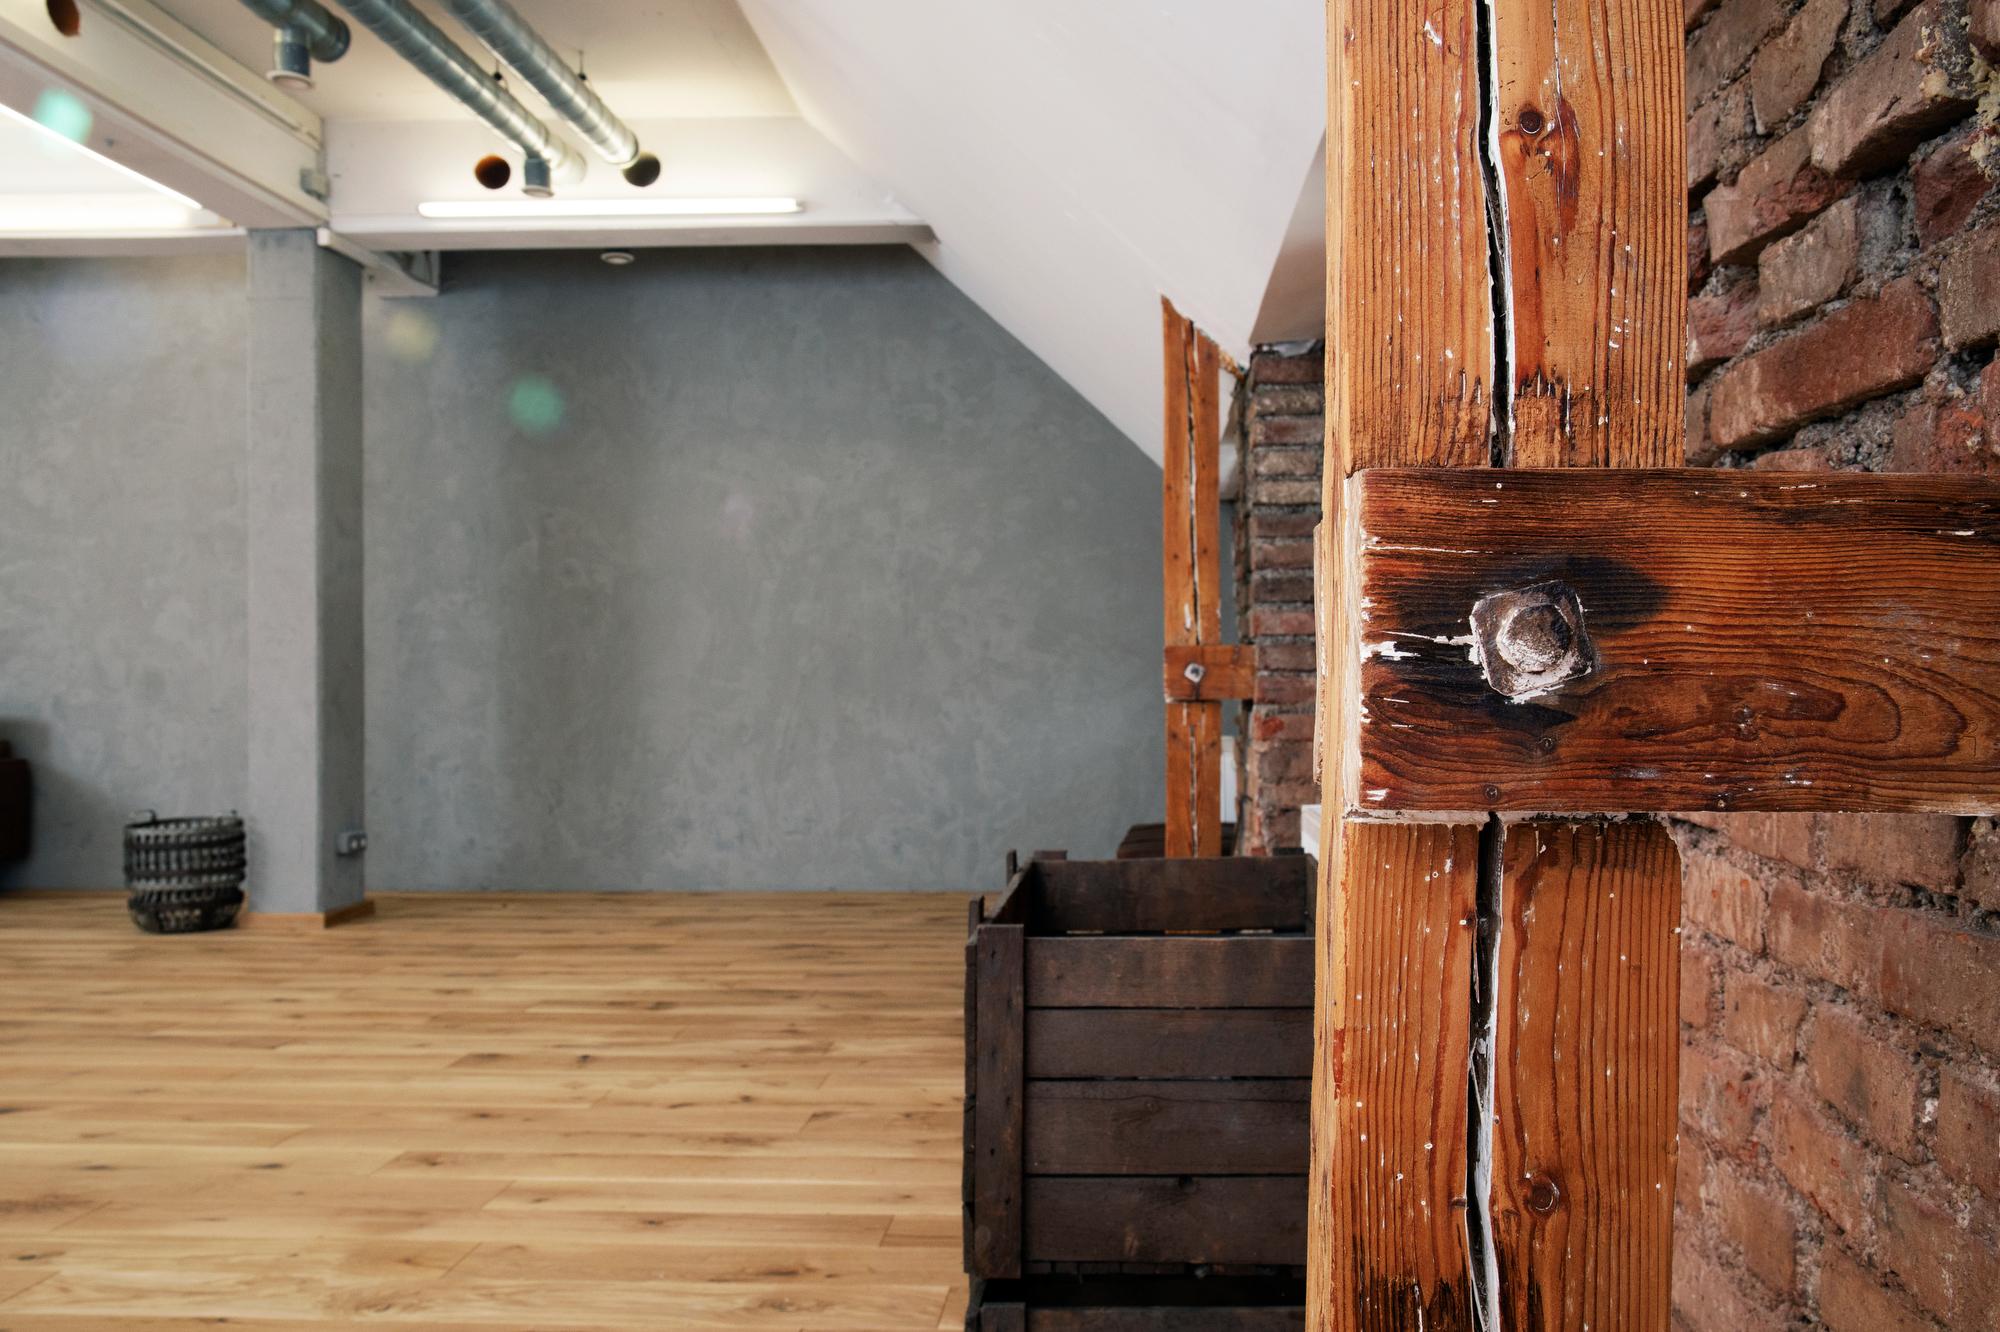 Mietstudio München Stemmerhof Studios Sendling